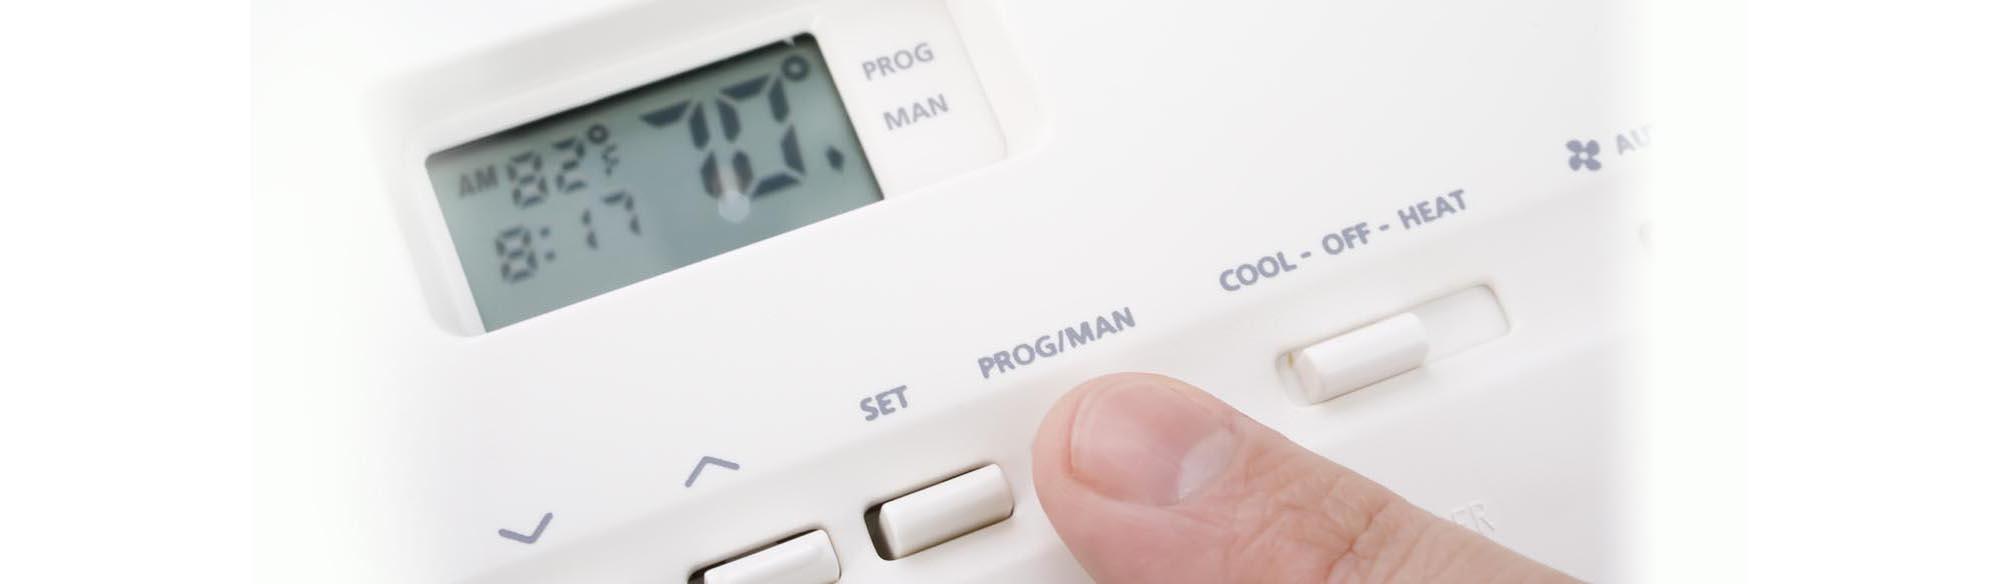 indoor-air-quality | Armbrust Plumbing Inc